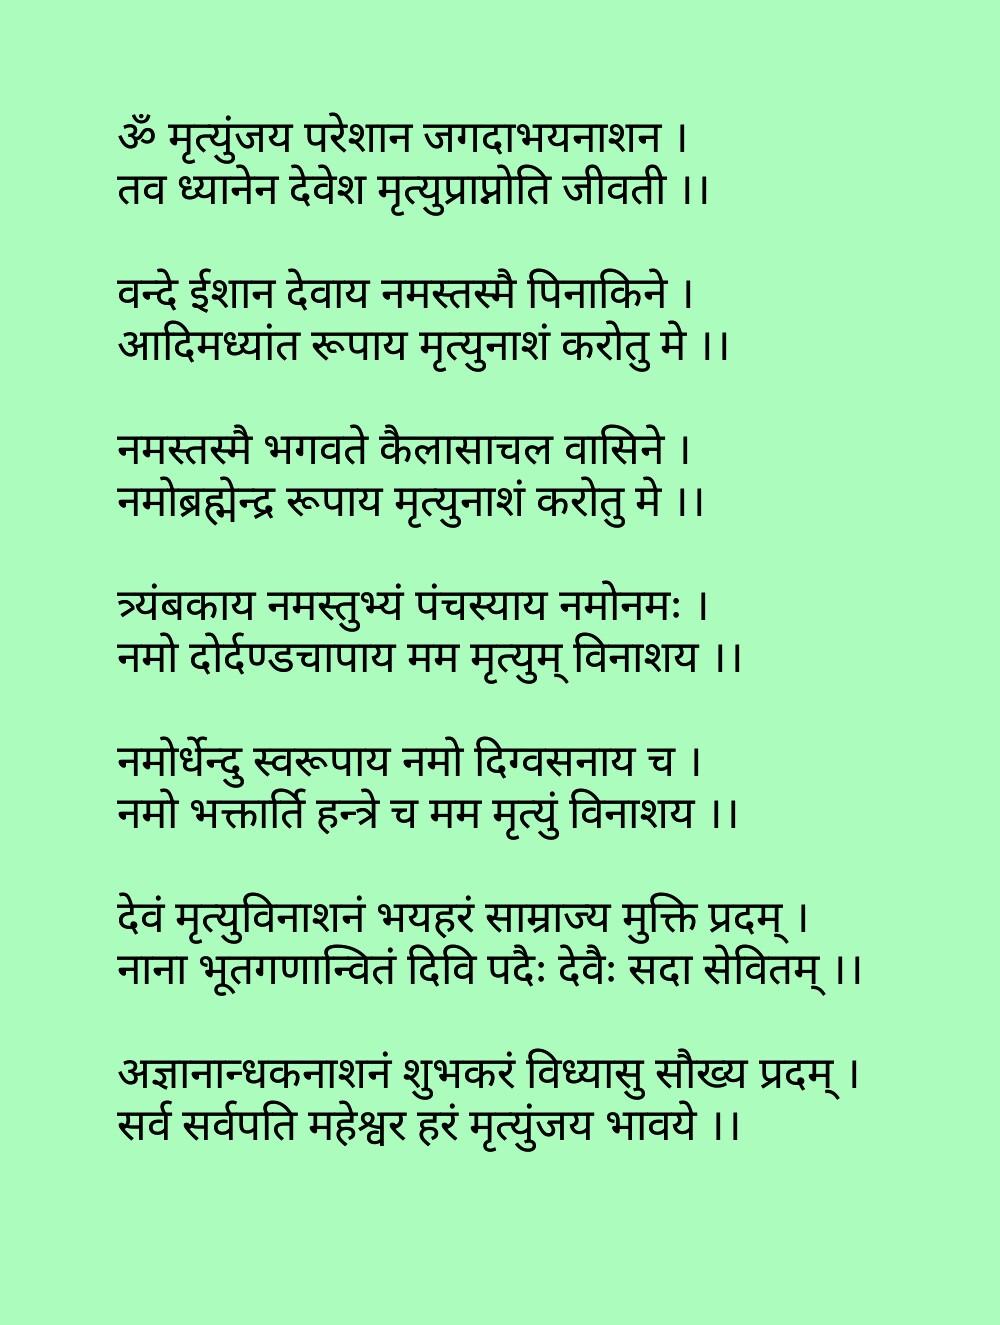 Shiv aavahan mantra - Lyrics, Benefits, PDF - Doshi Dhrumit